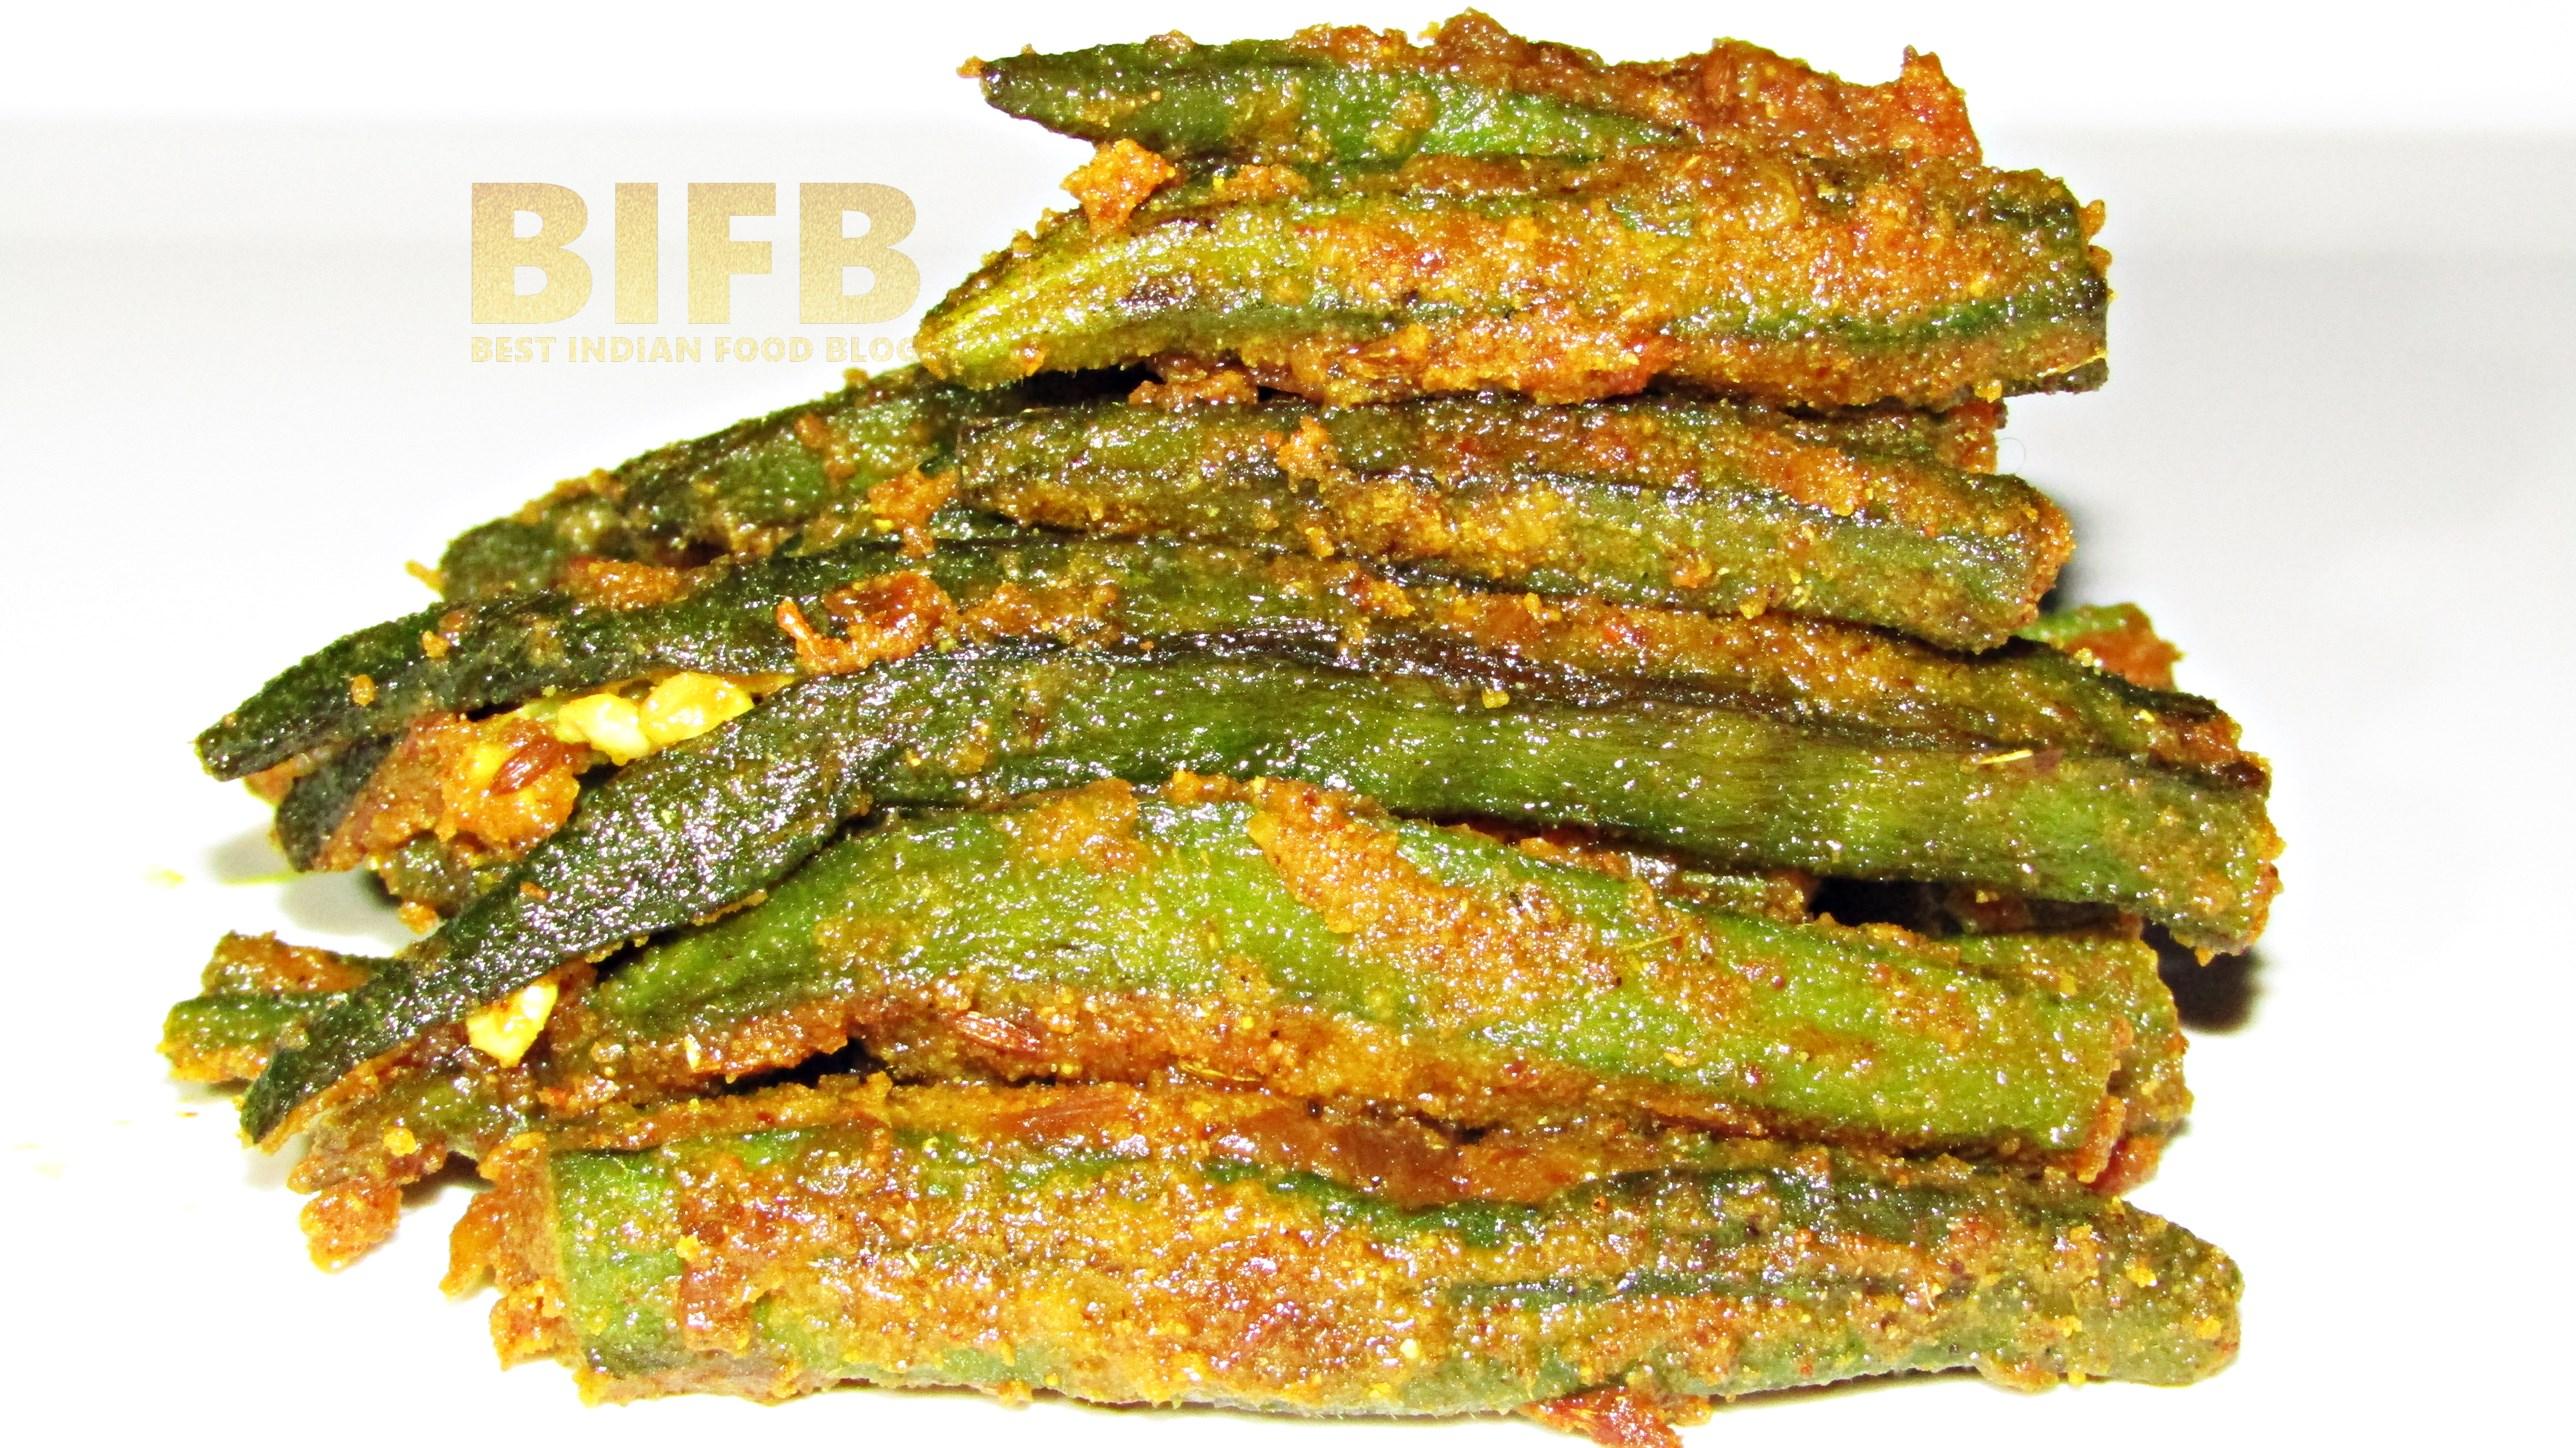 Besan Bhindi from Rajasthan, India | Best Indian Food Blog